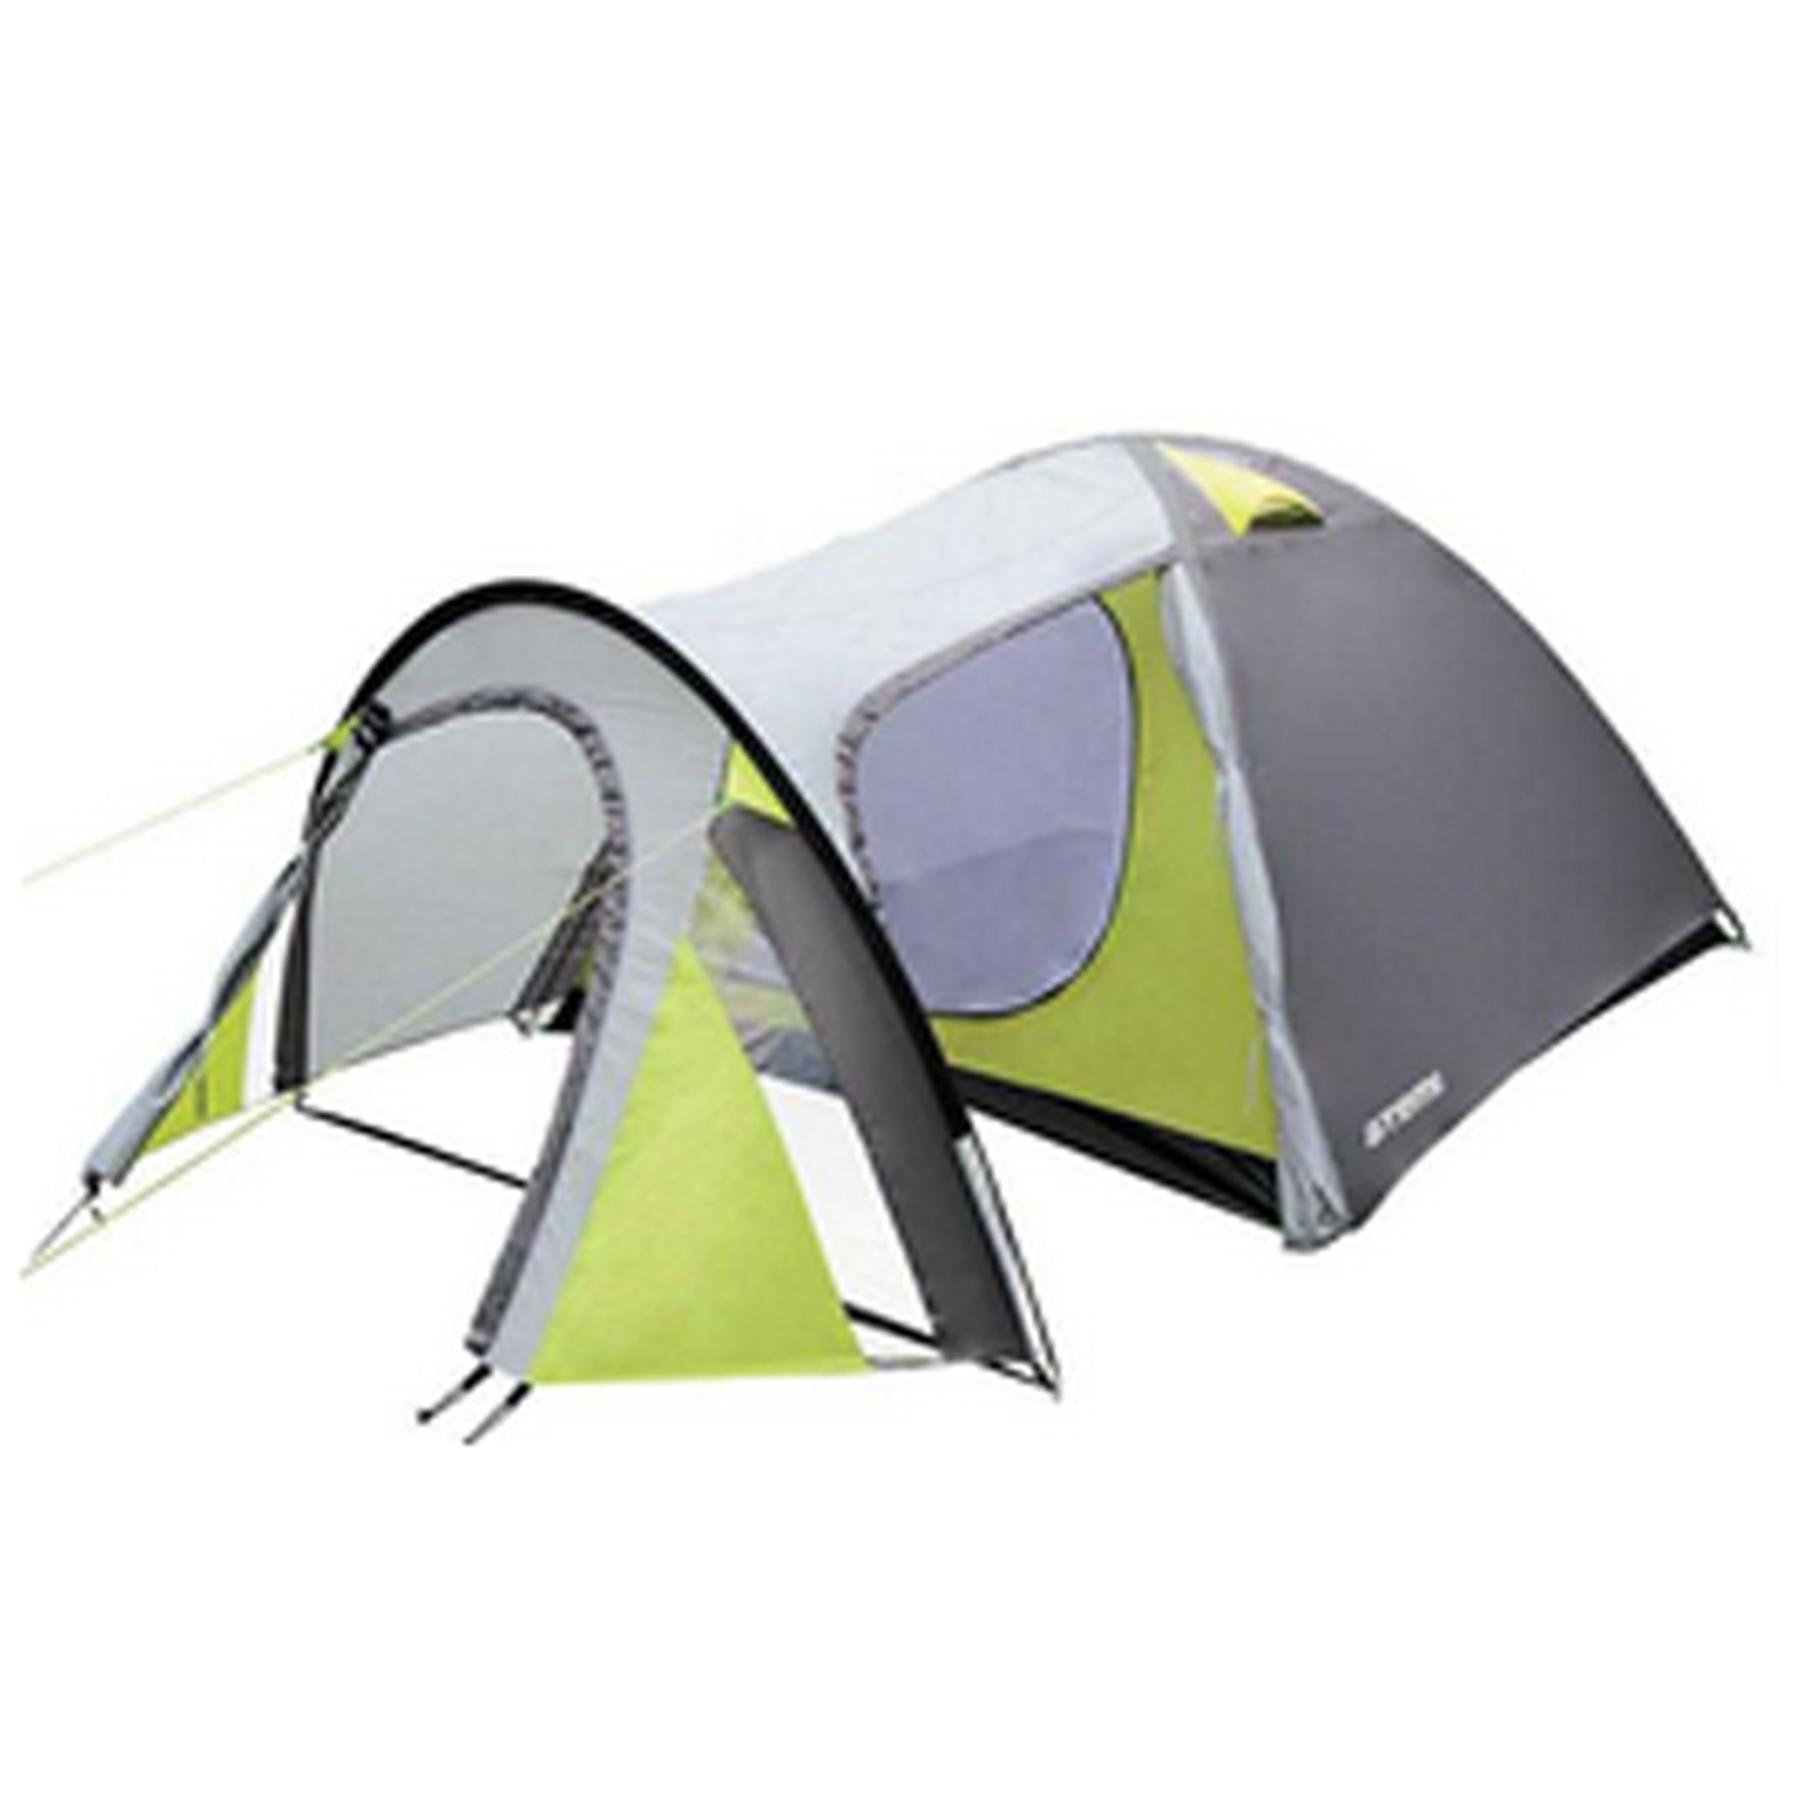 Палатка АТ Taiga 4 (8 кг, водост. 3000 мм, 240+120*250см h-155см)